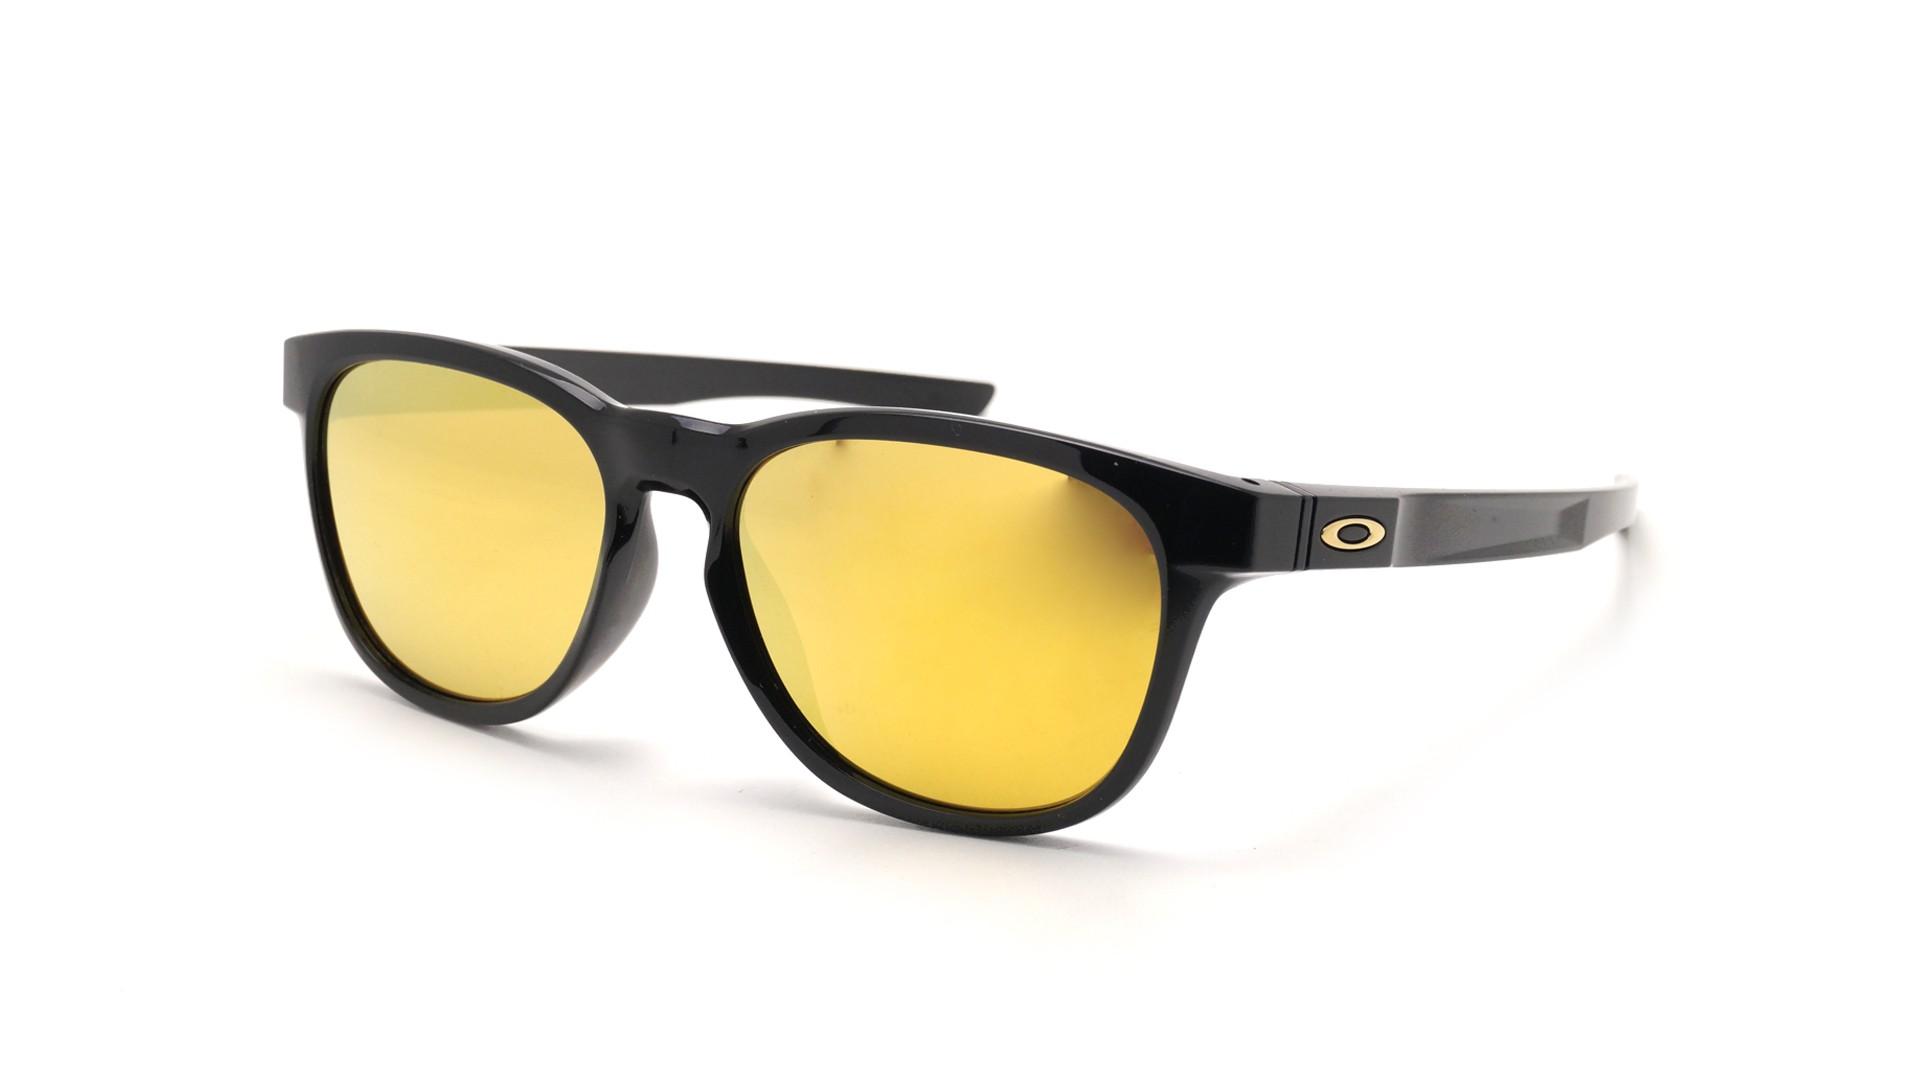 3a36b7603c Oakley Stringer Polished black OO9315 04 55-16